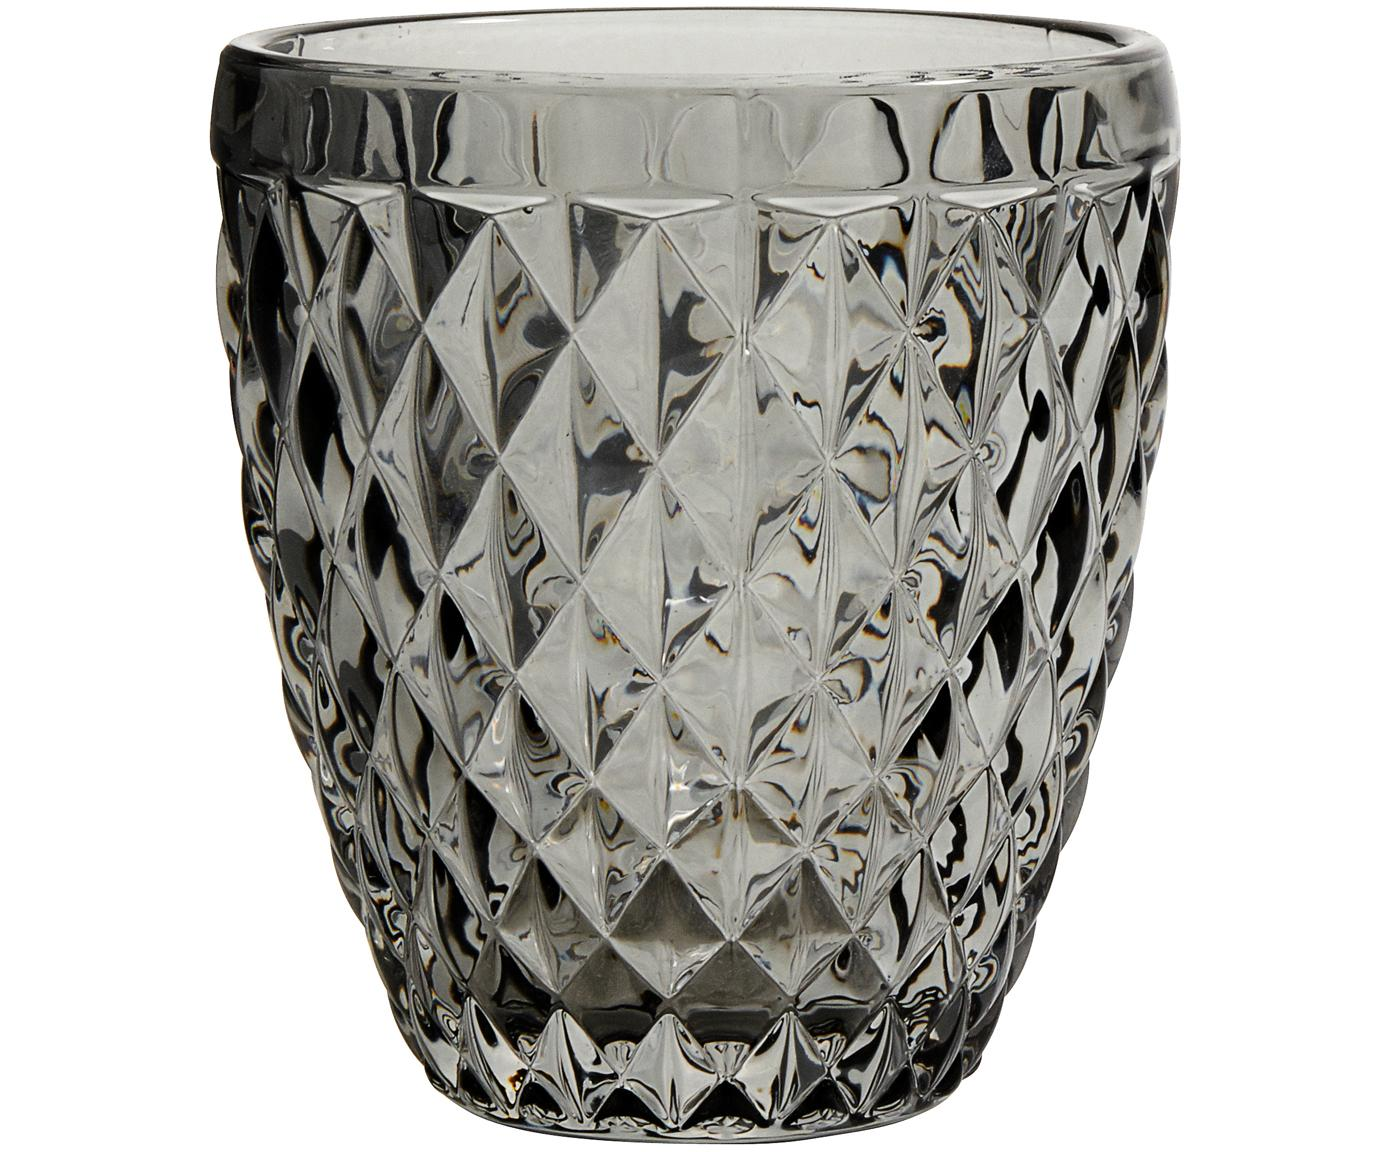 Szklanka do wody Diamond, 6 szt., Szkło, Ciemnyszary, lekko transparentny, Ø 9 x W 10 cm